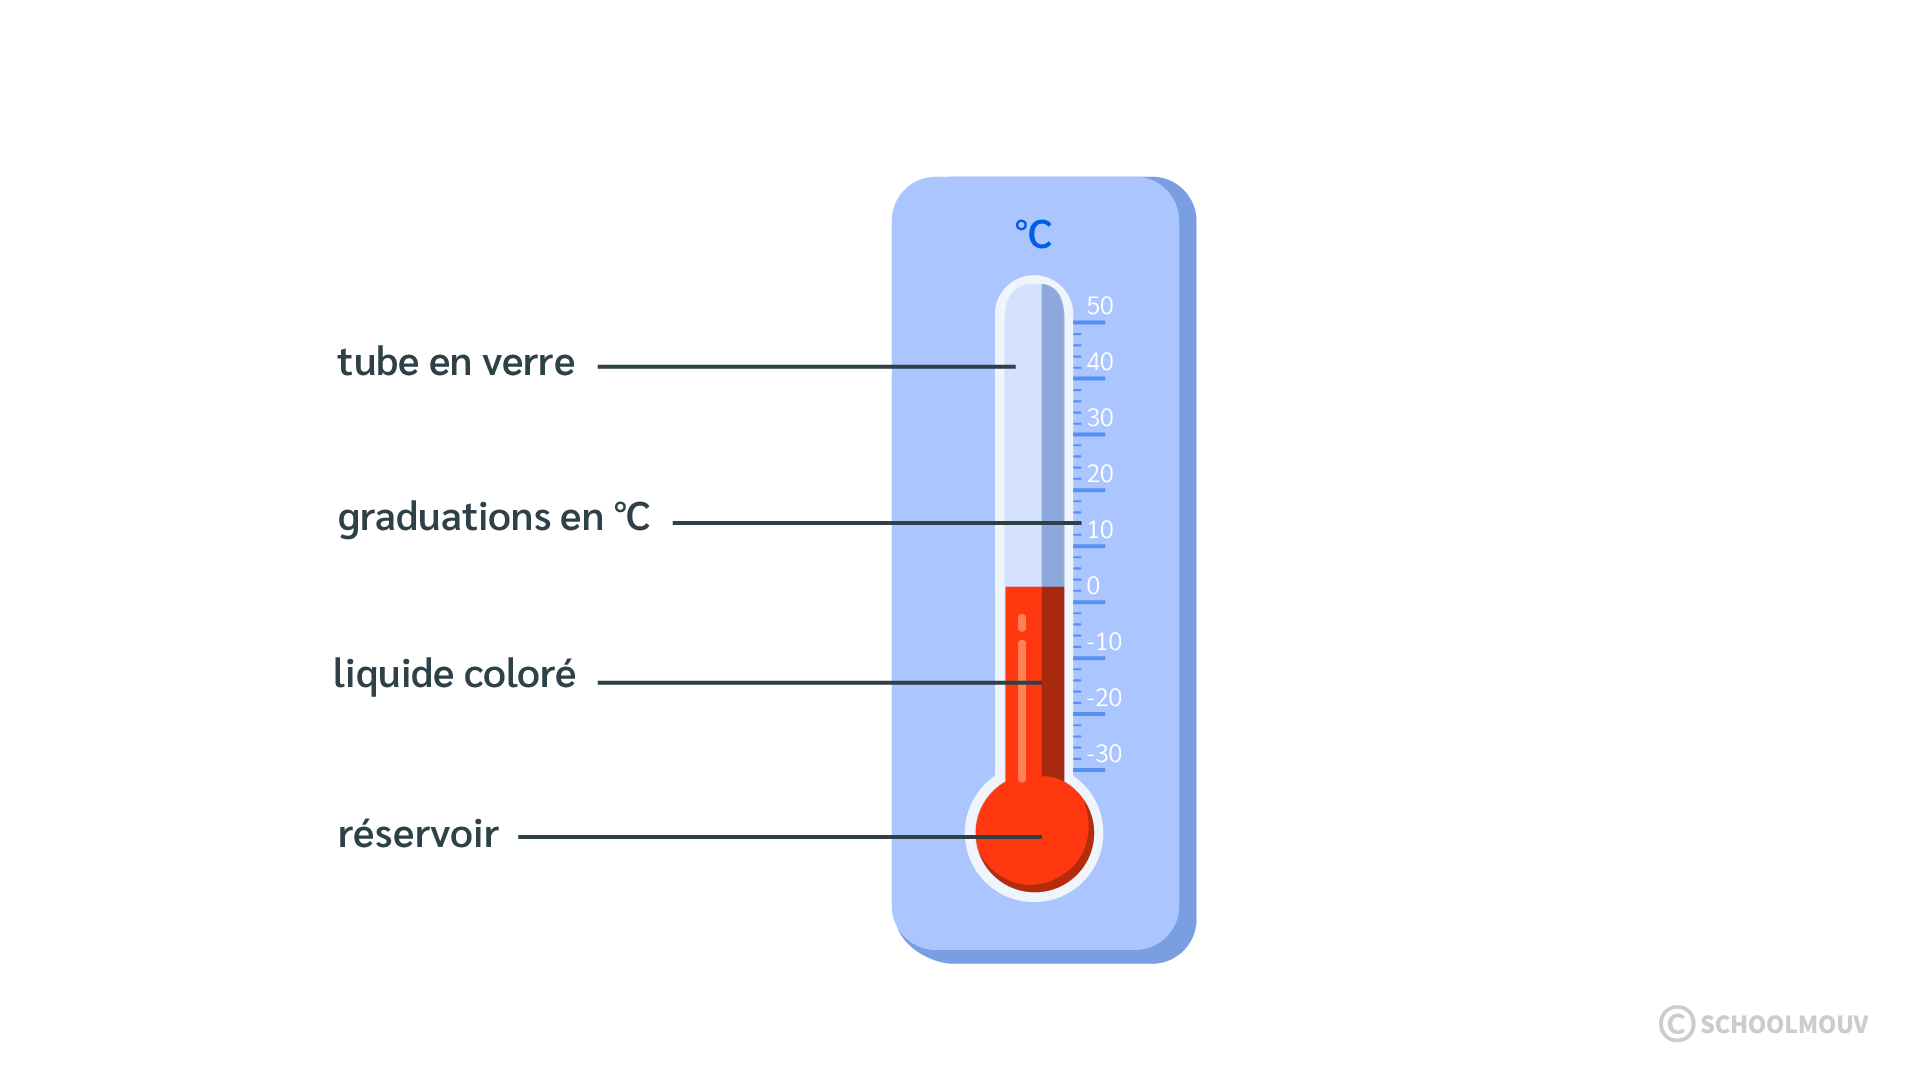 Thermomètre - Mesurer la température - Schéma - SchoolMouv - Sciences - CE1